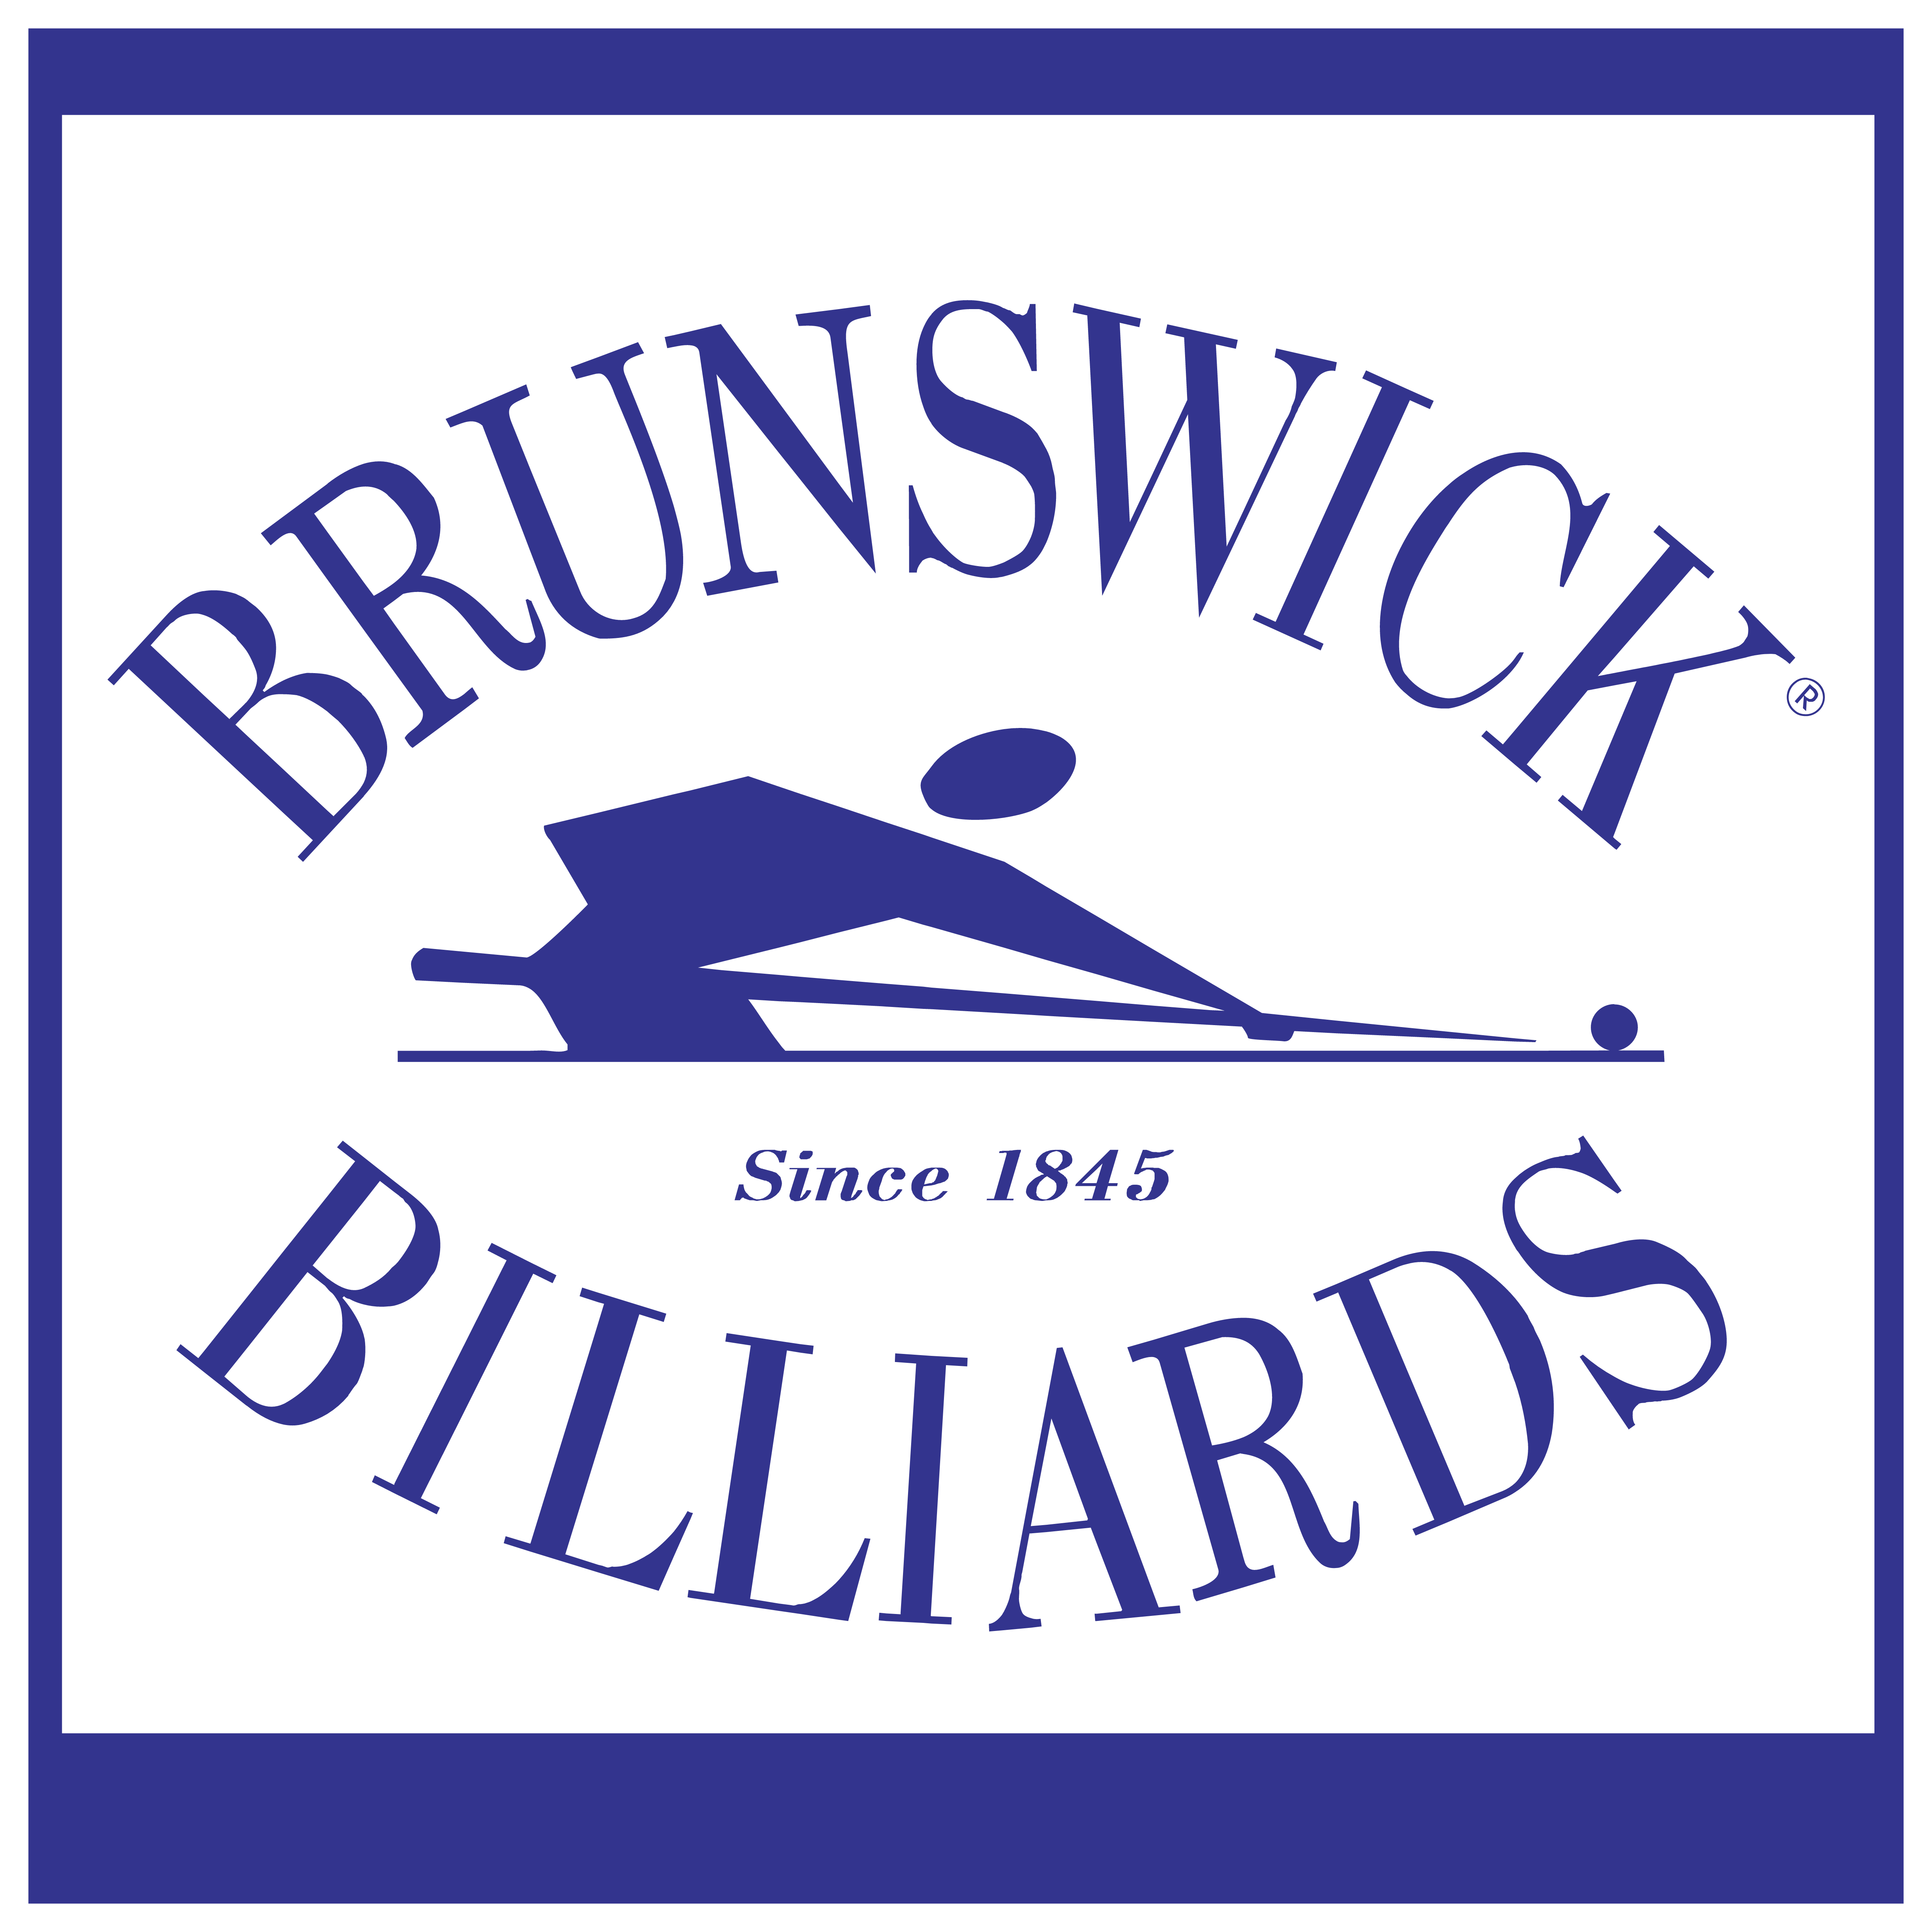 billiard logos - AOL Image Search Results   Billiards Logo